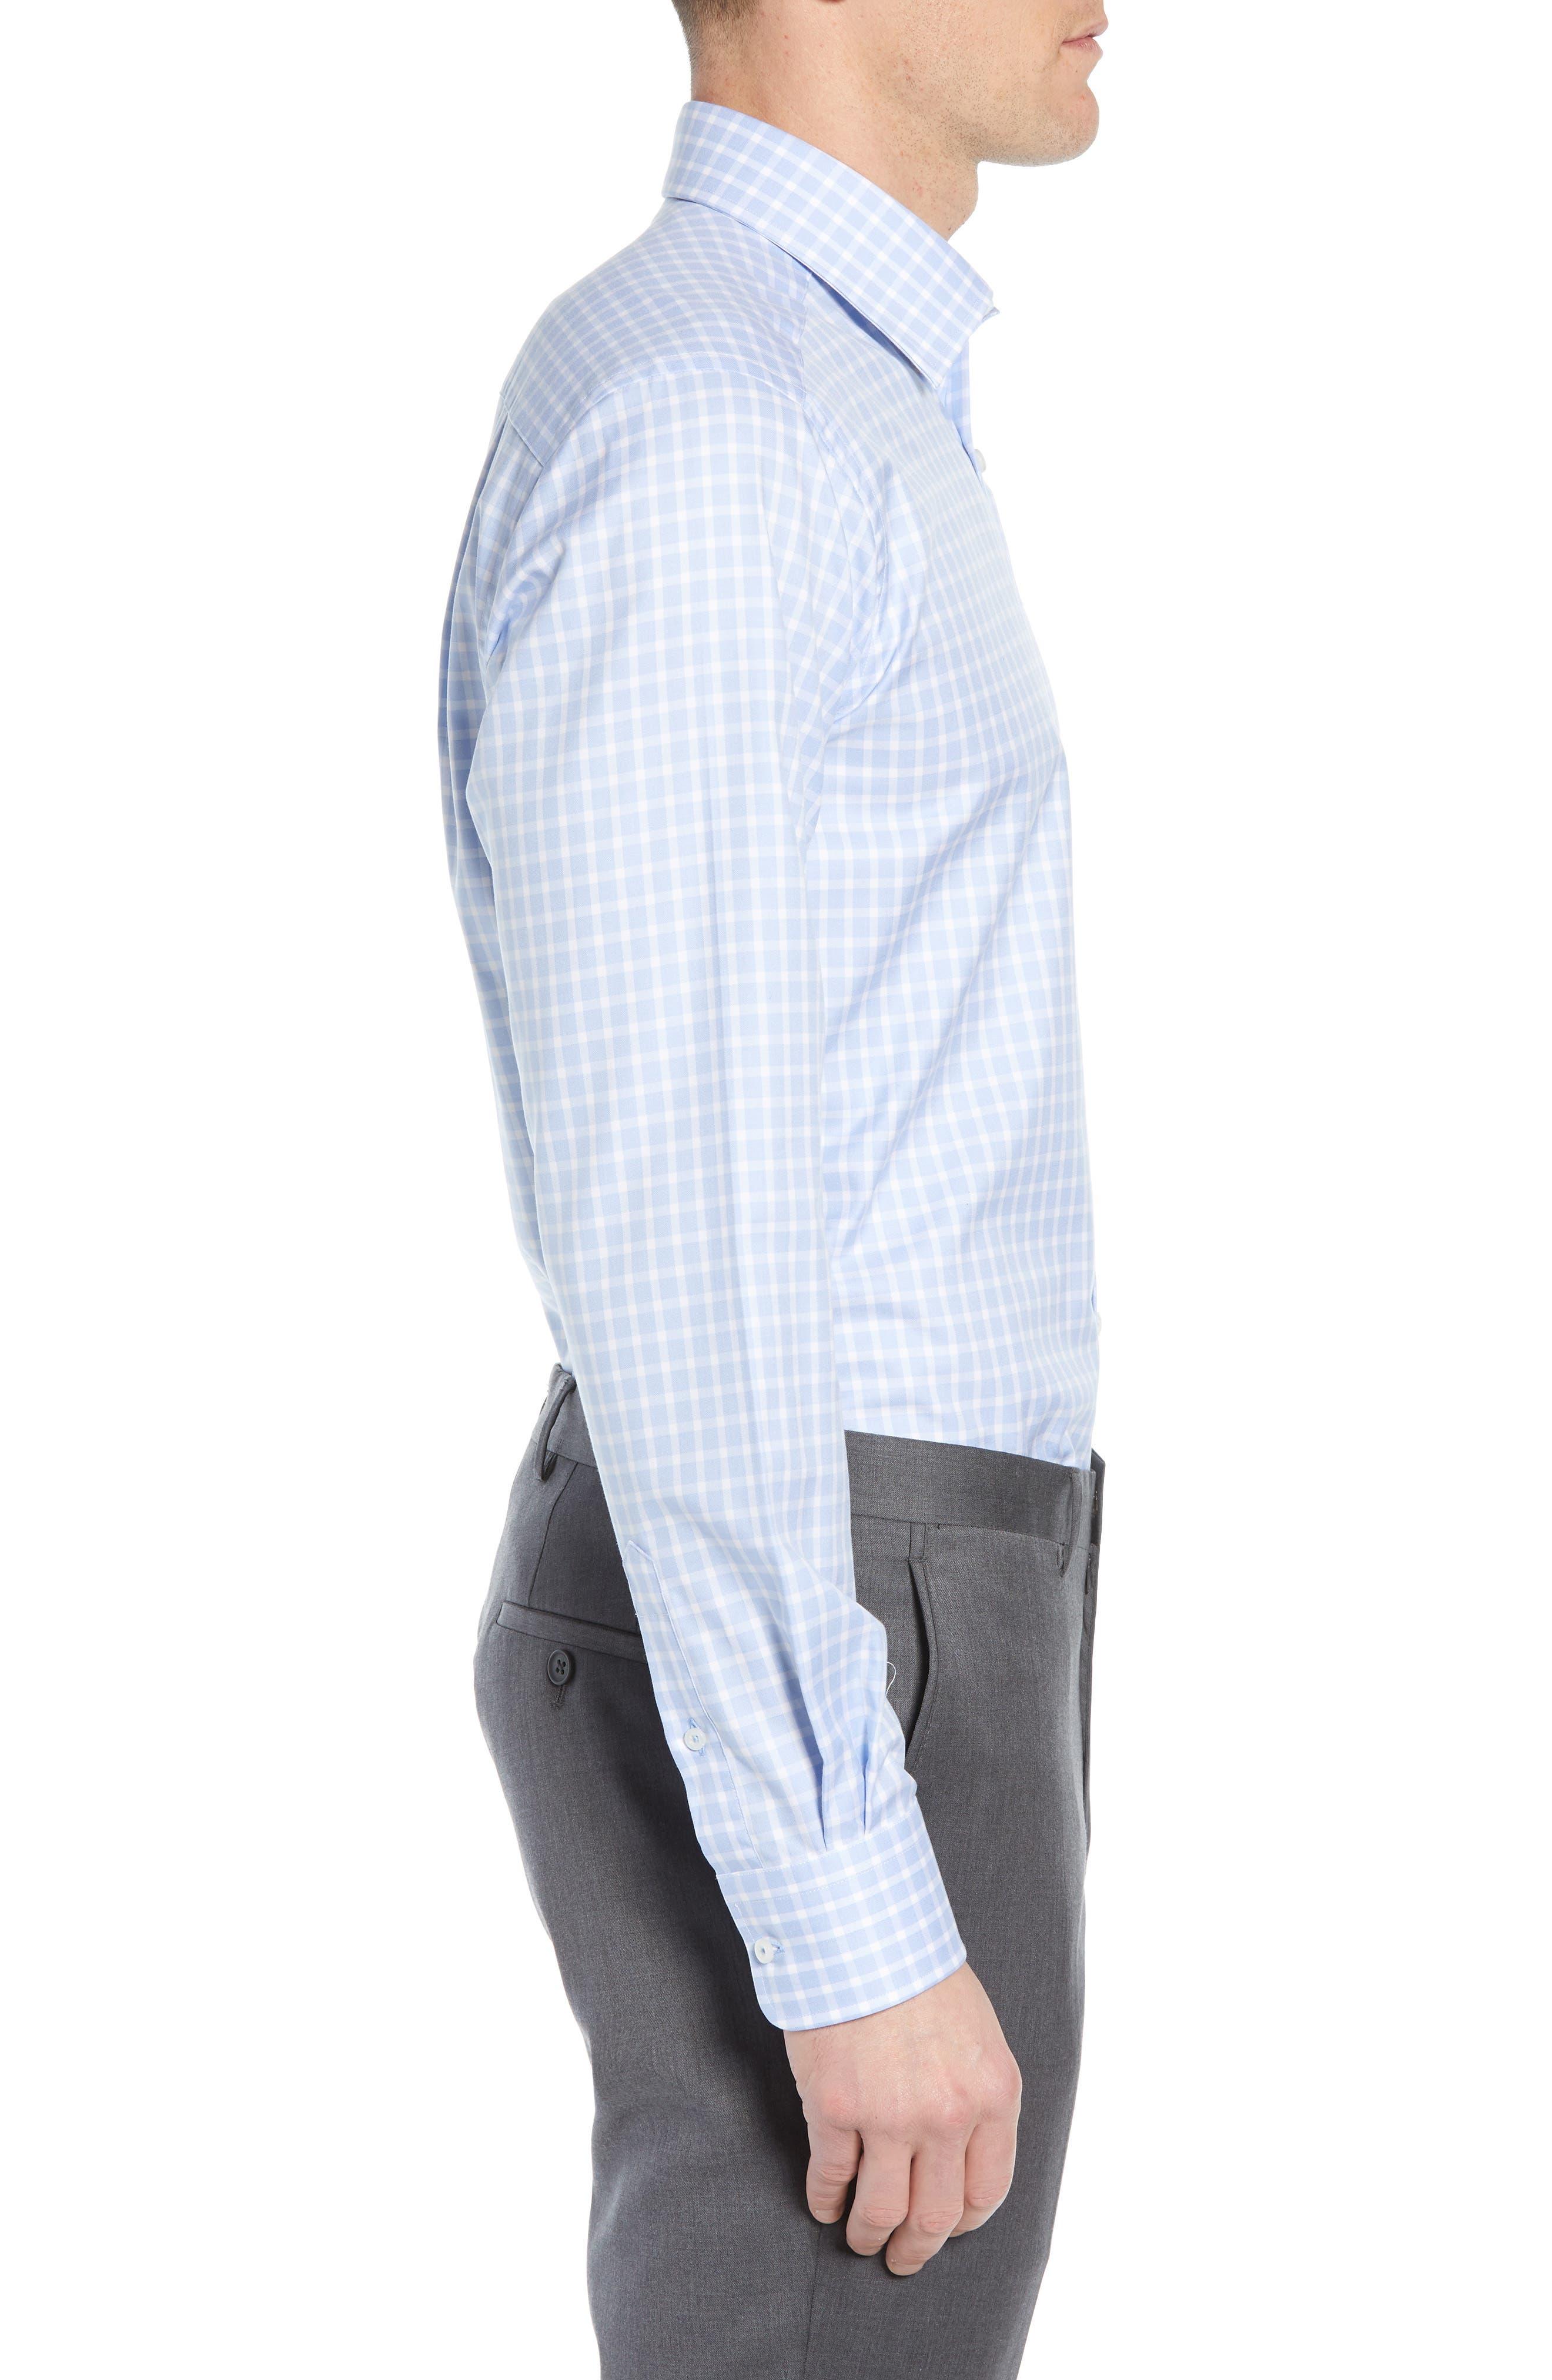 DAVID DONAHUE, Trim Fit Check Dress Shirt, Alternate thumbnail 4, color, BLUE